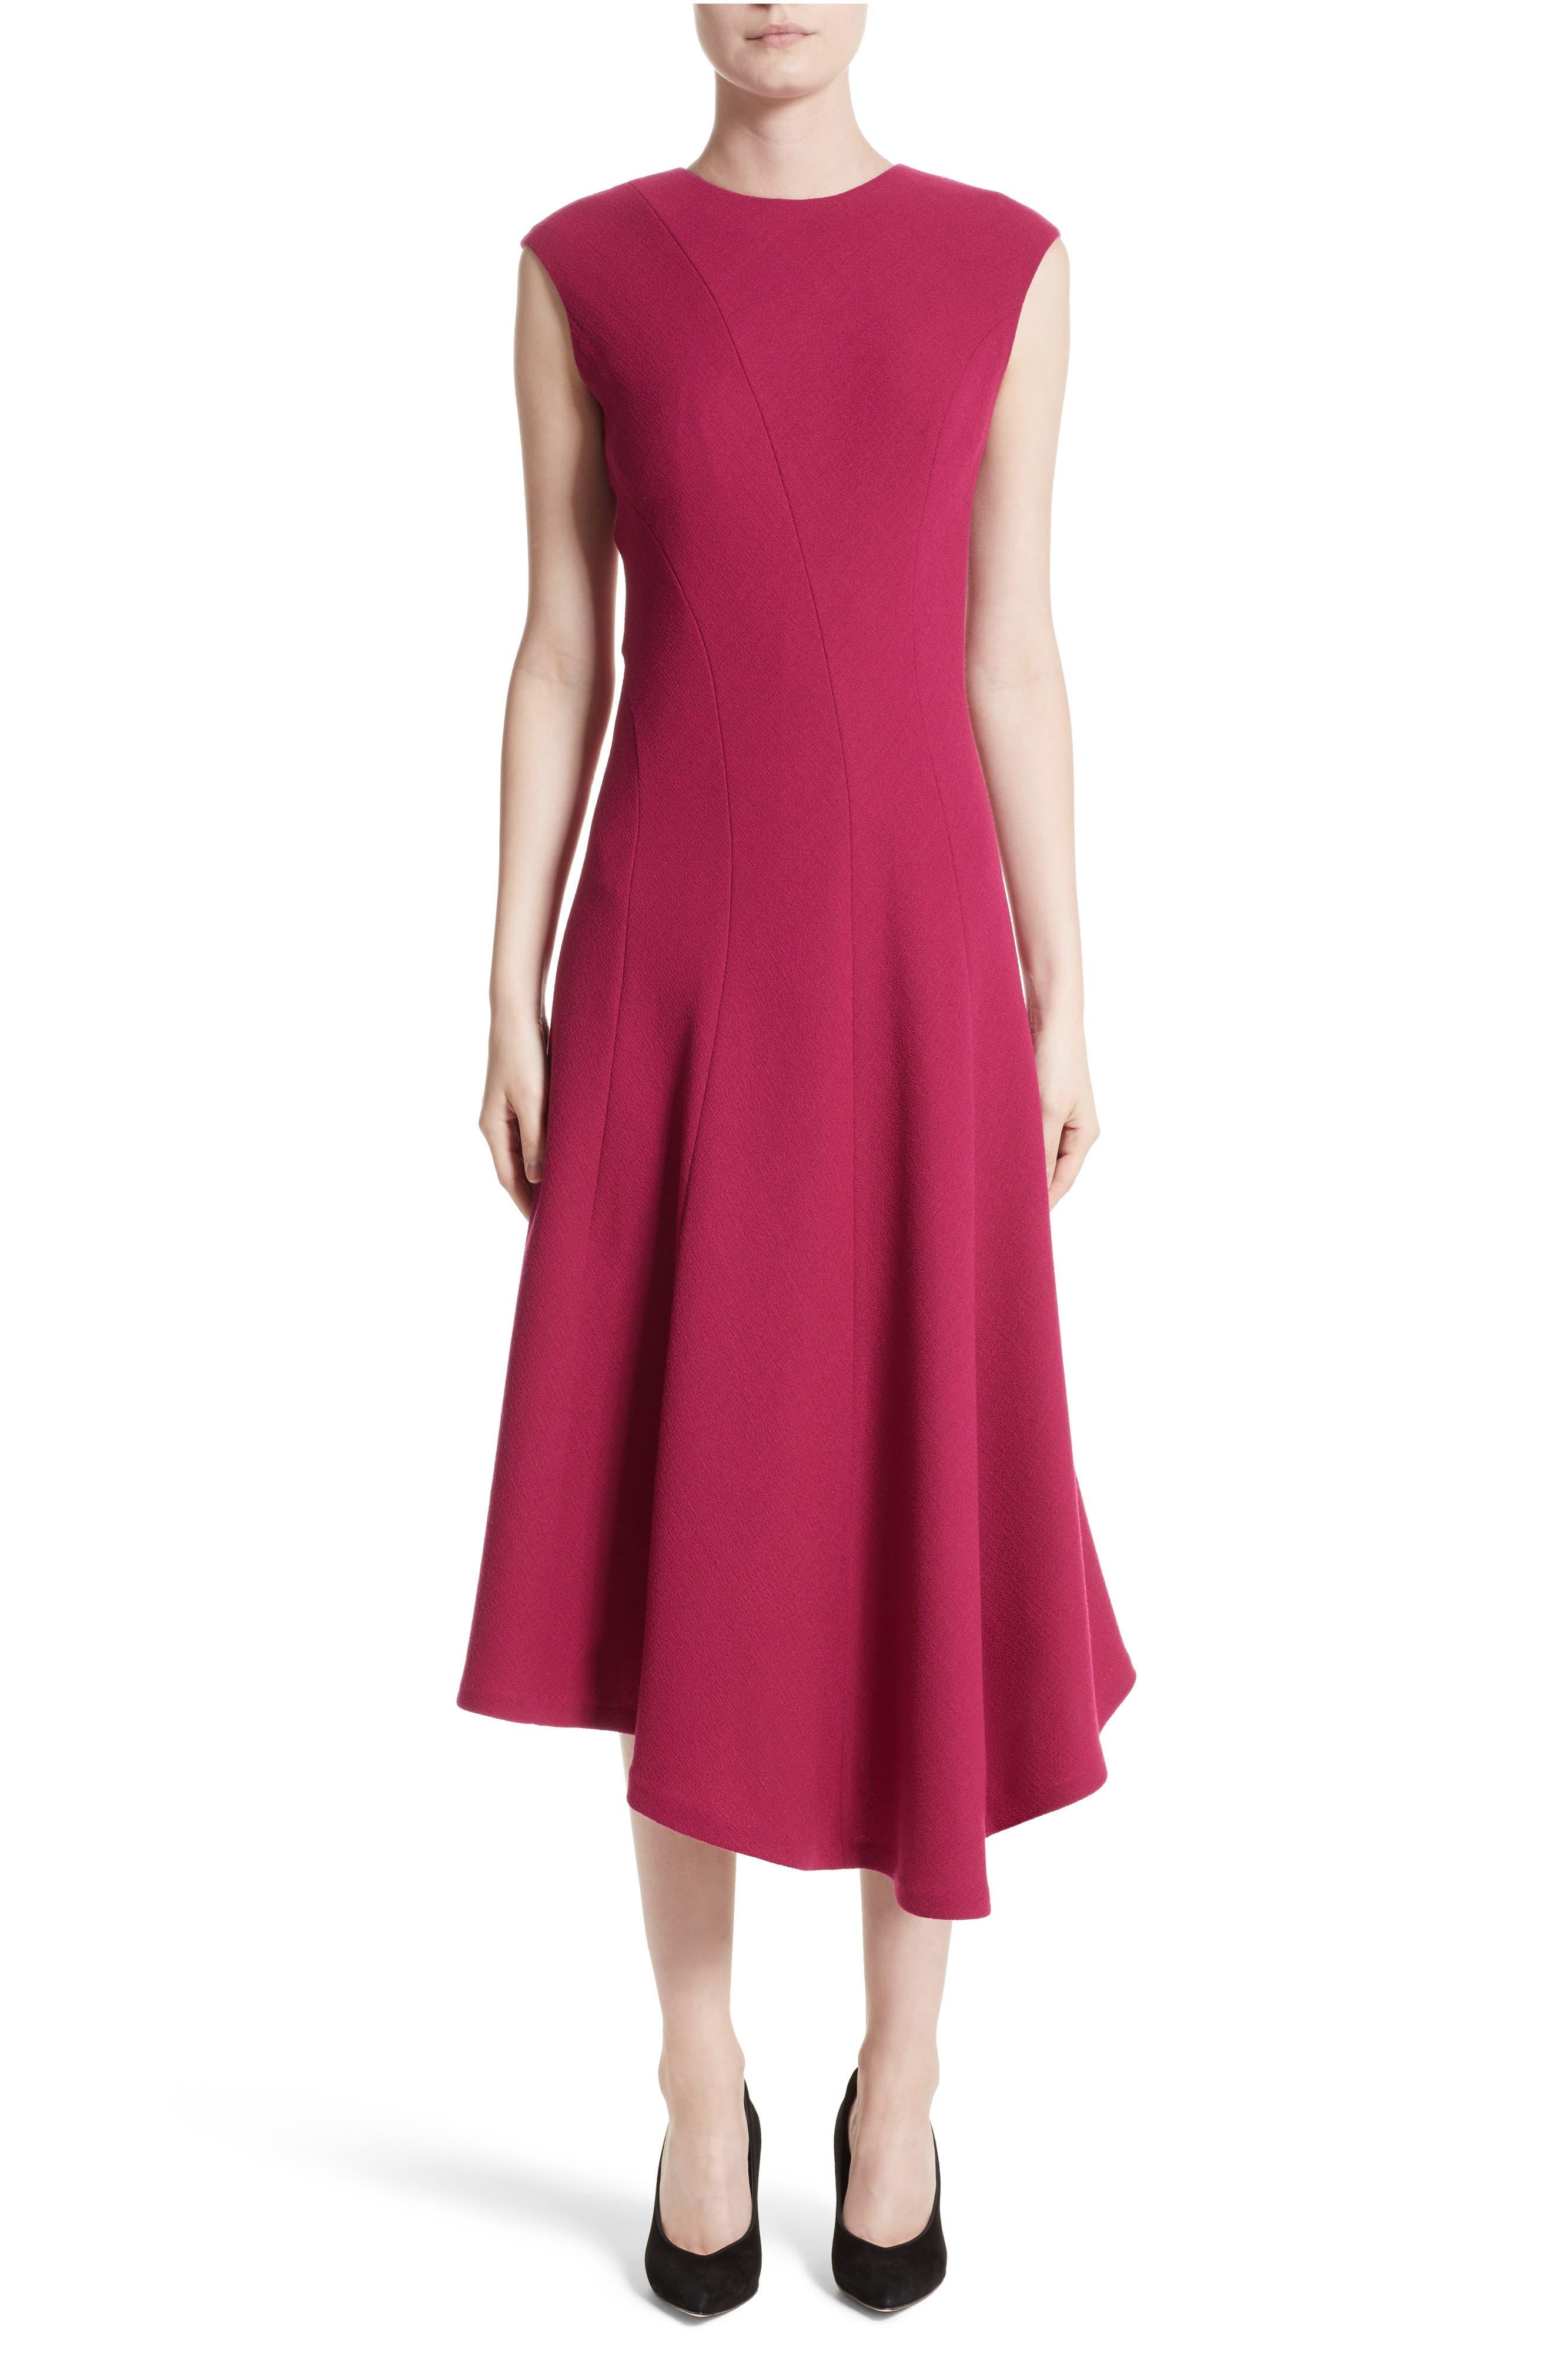 Alternate Image 1 Selected - Lafayette 148 New York Aveena Wool Interlock Dress